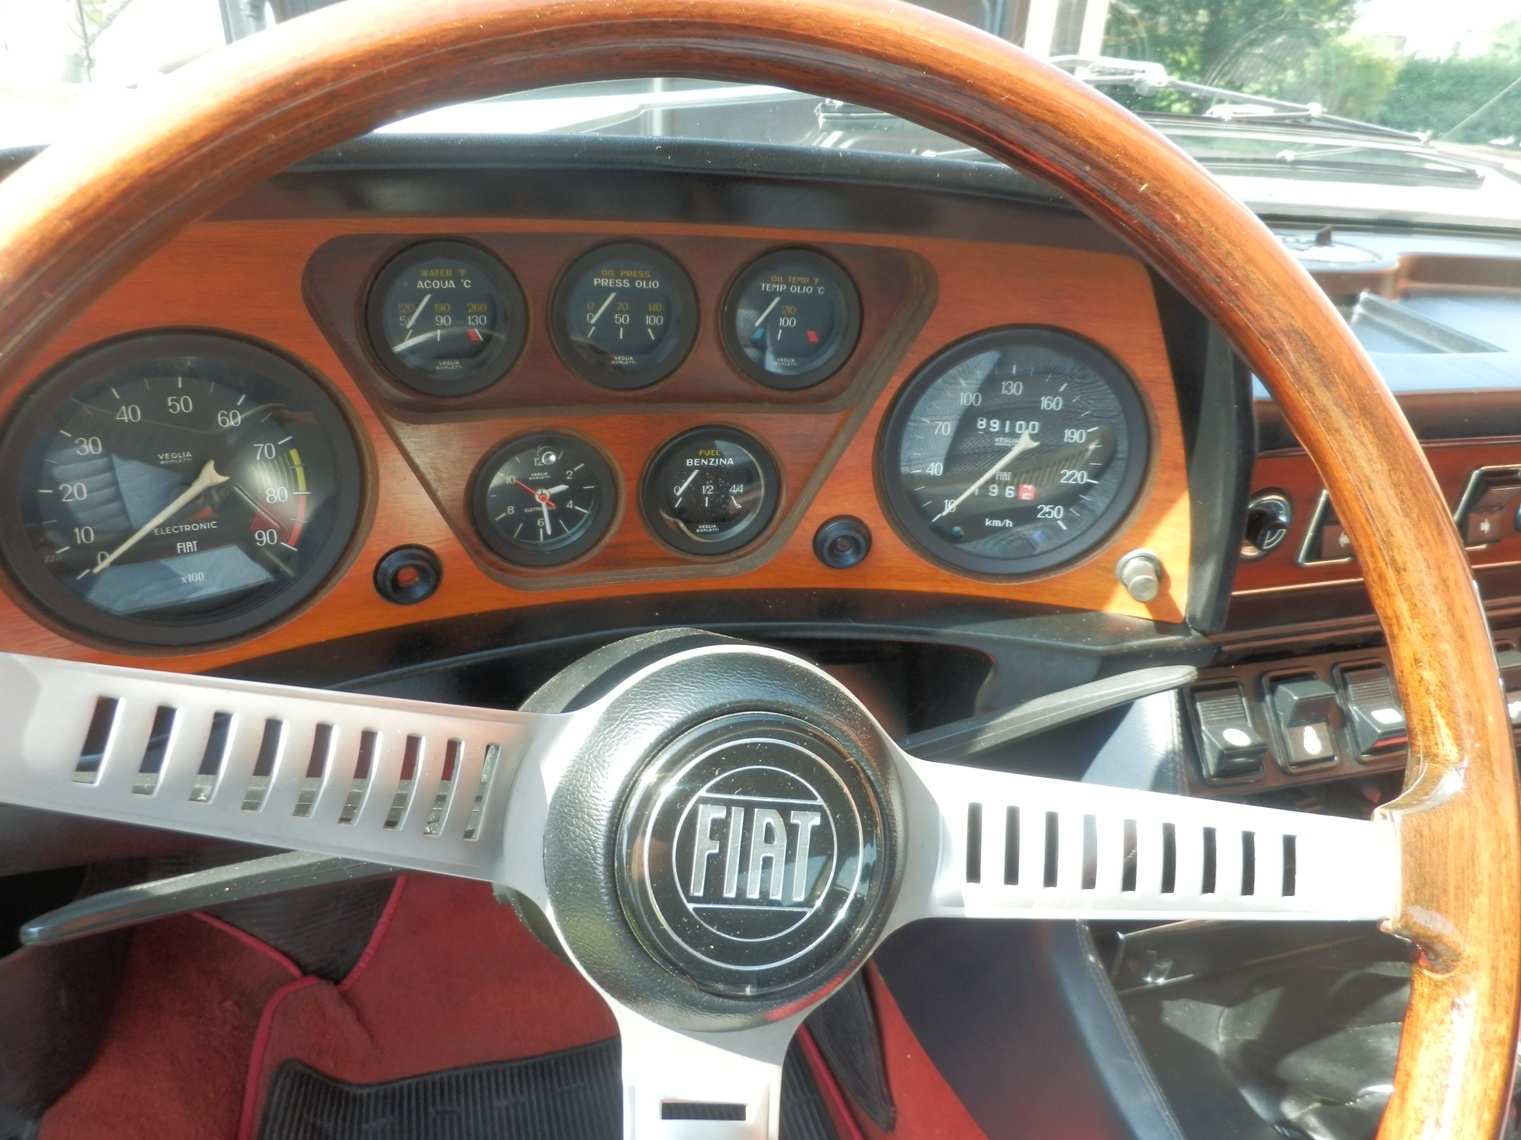 Fiat Dino coupè 2400 top conditions